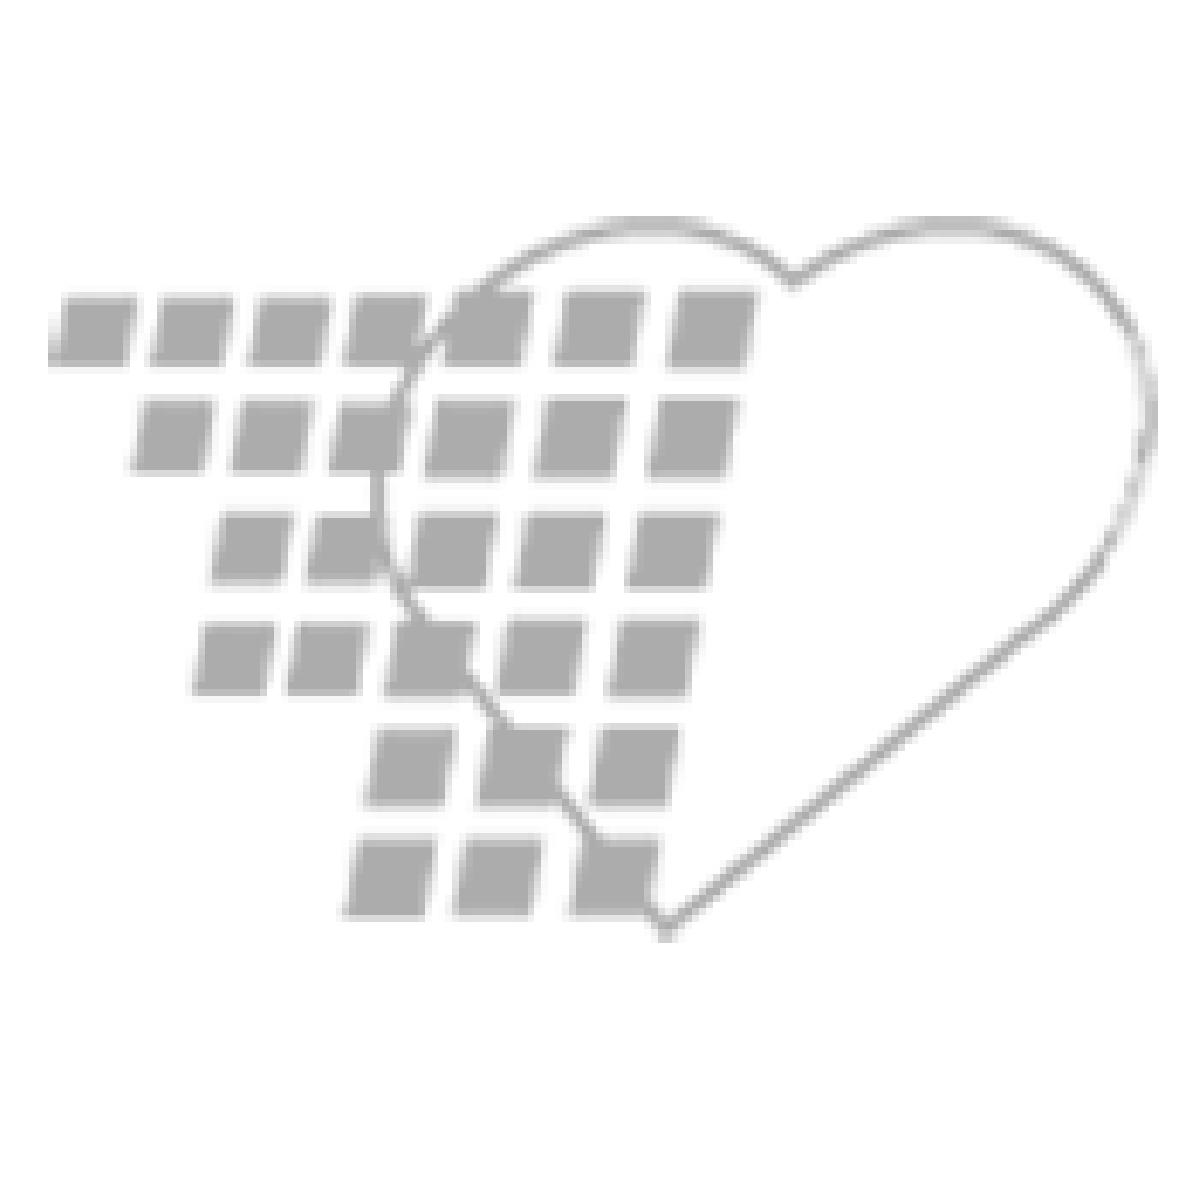 02-80-1111 - Pocket Nurse® Locking Stethoscope I.D. Tag